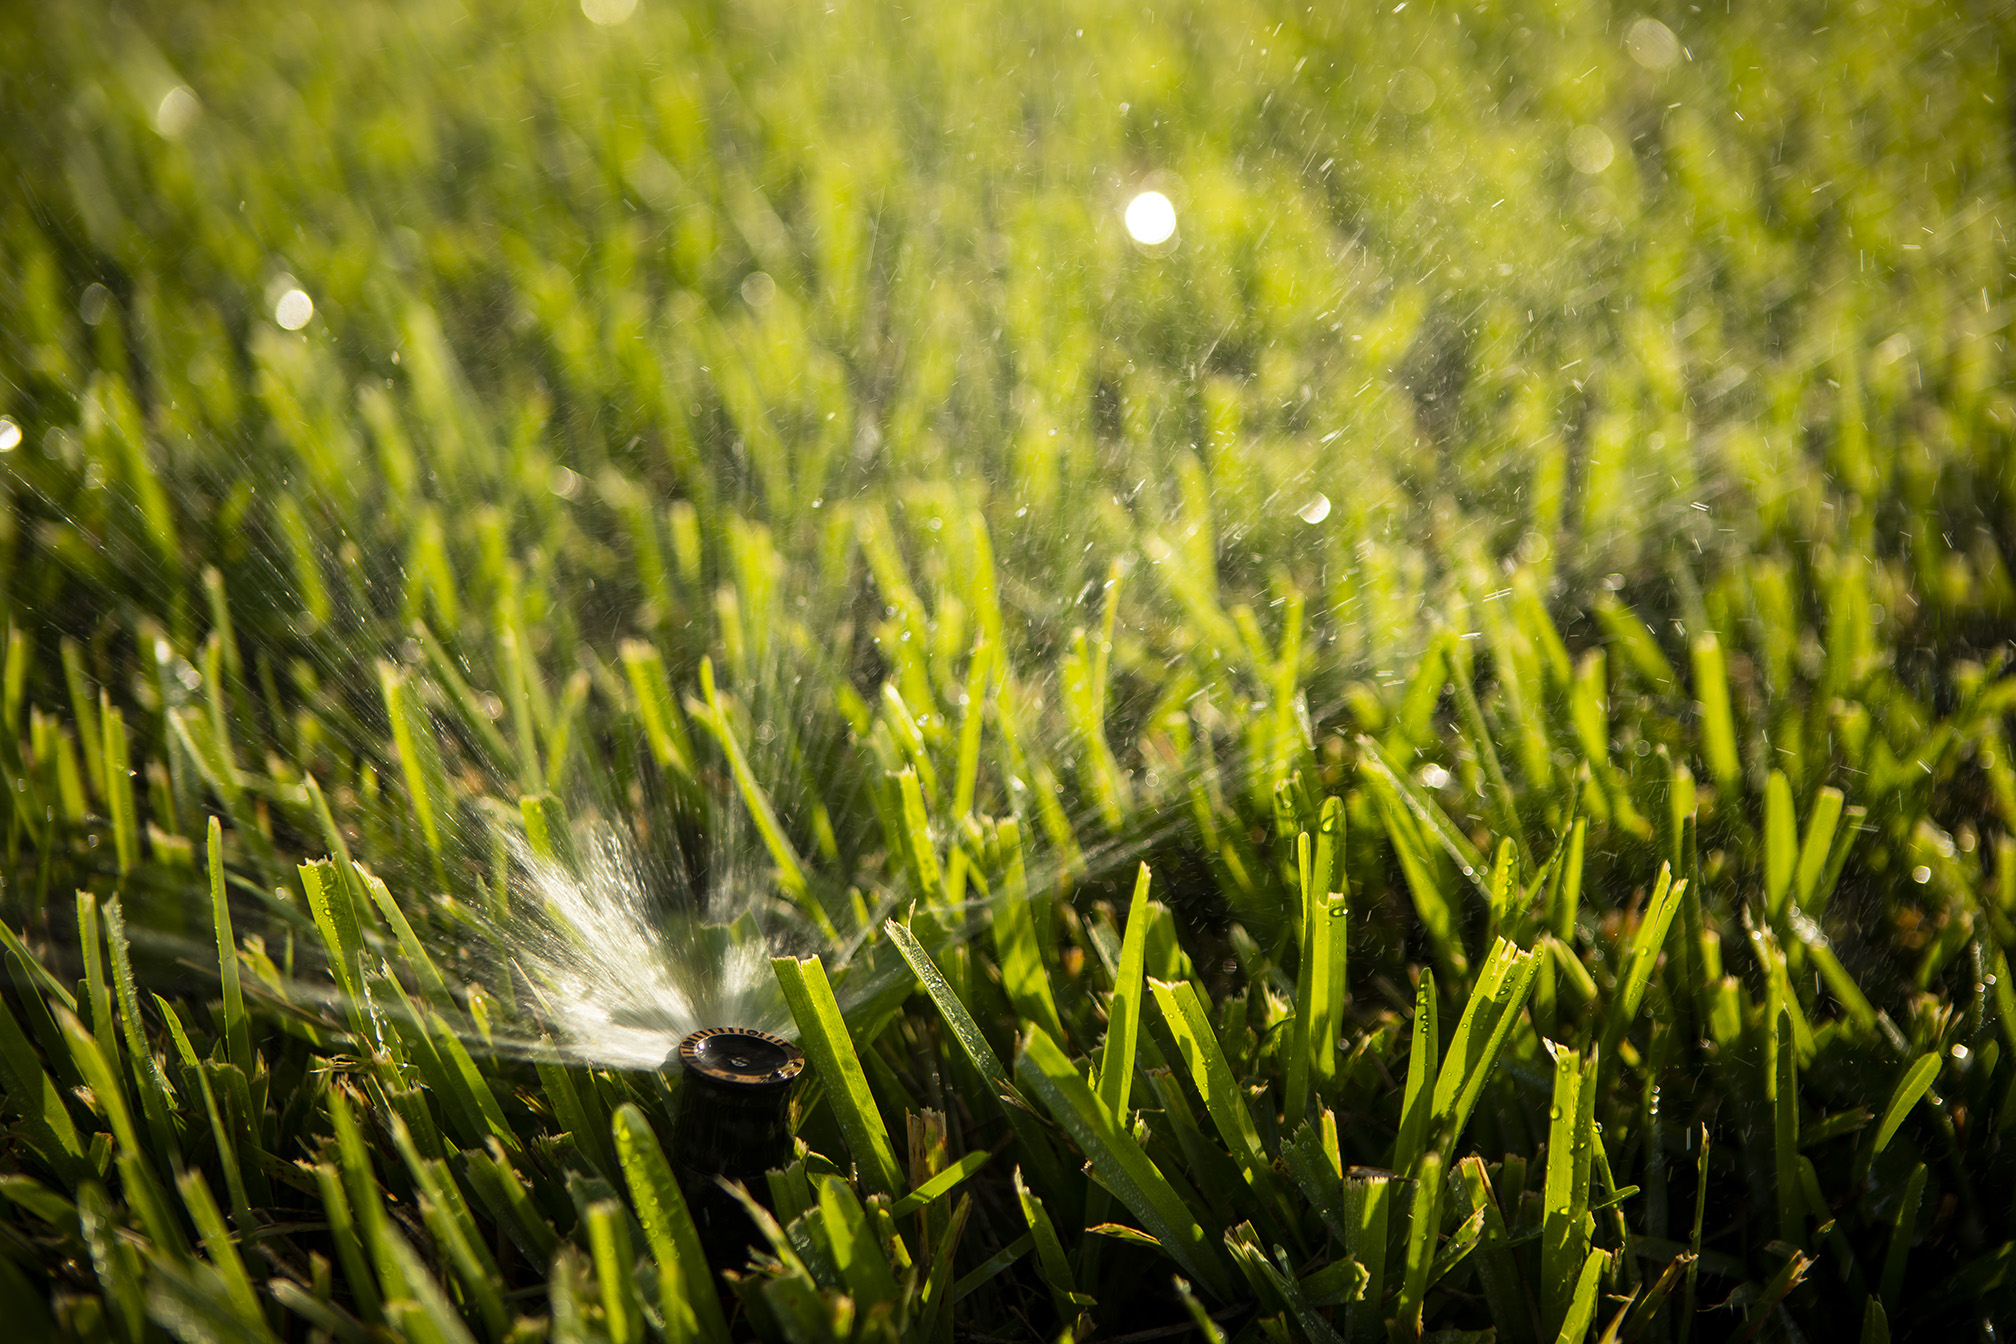 sprinkler head in lawn